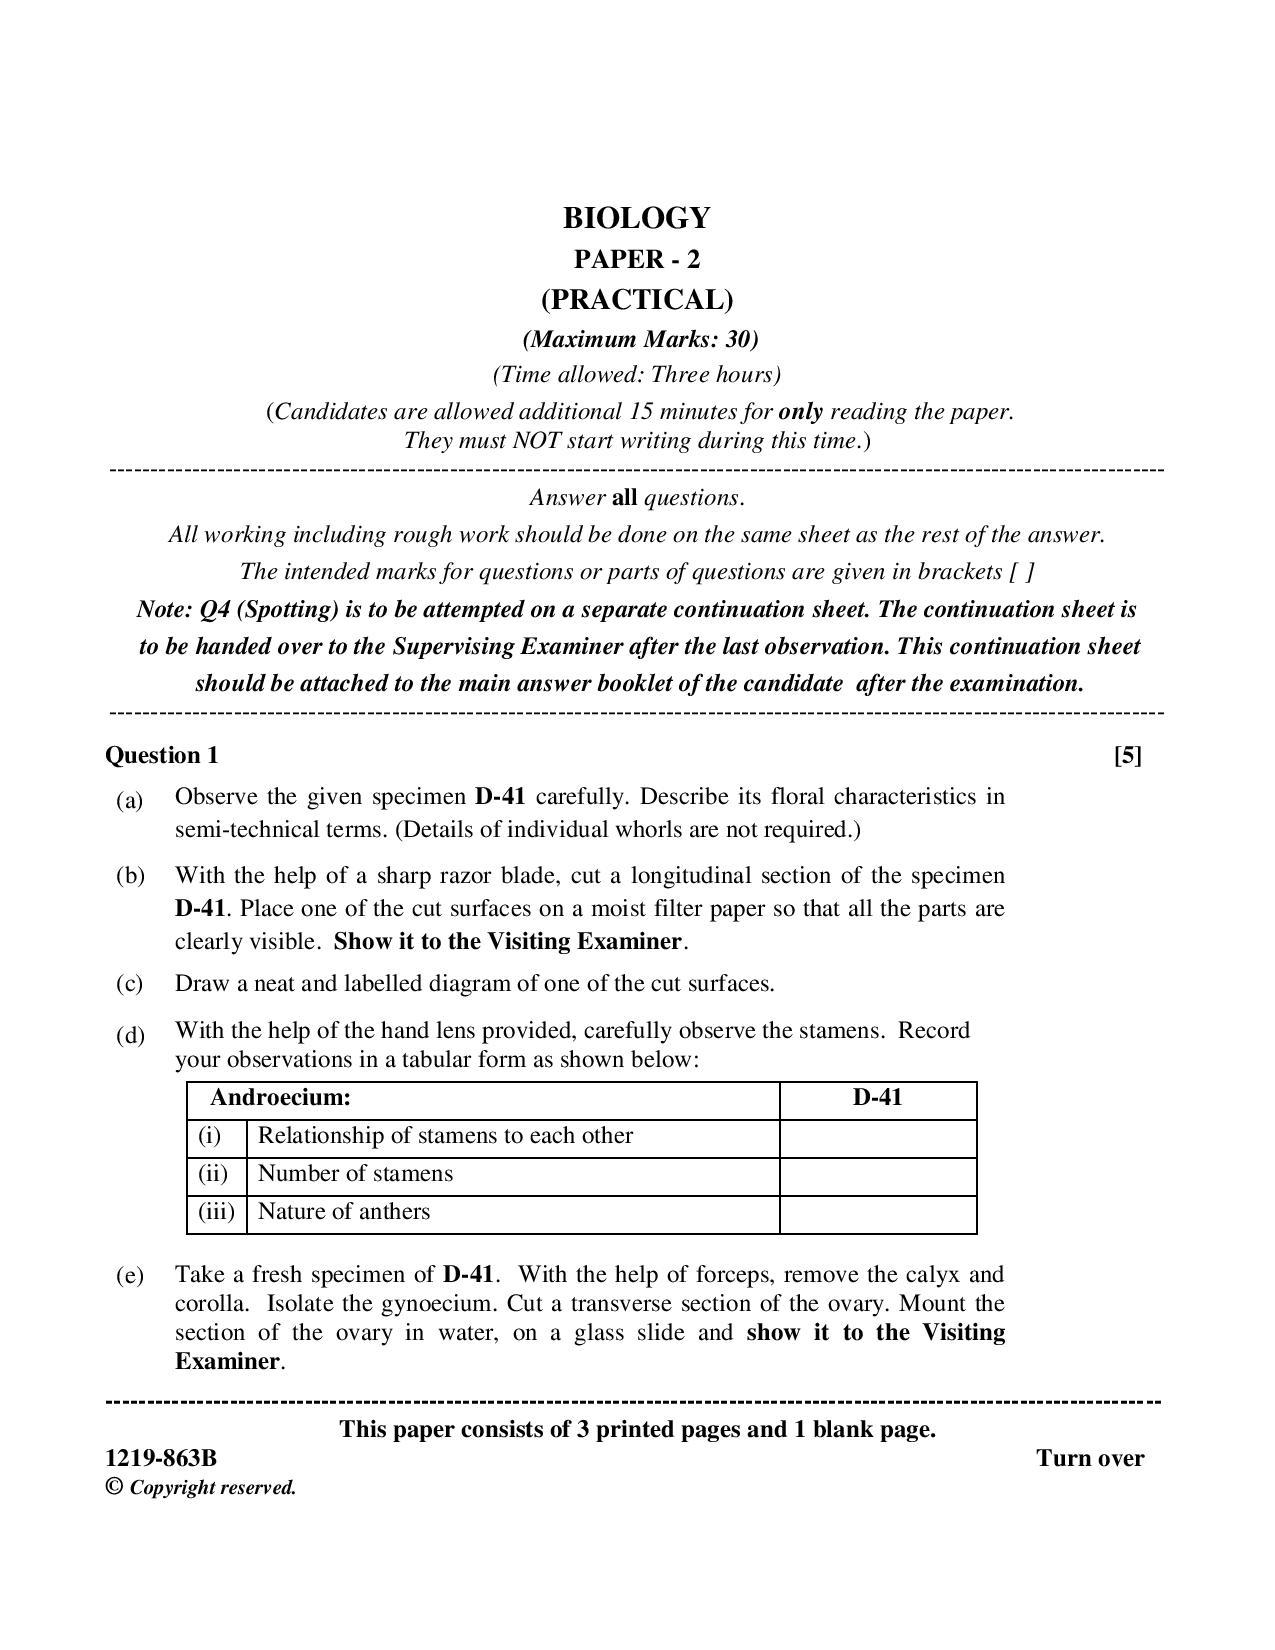 ISC Class 12 Biology practical 2019 Question Paper